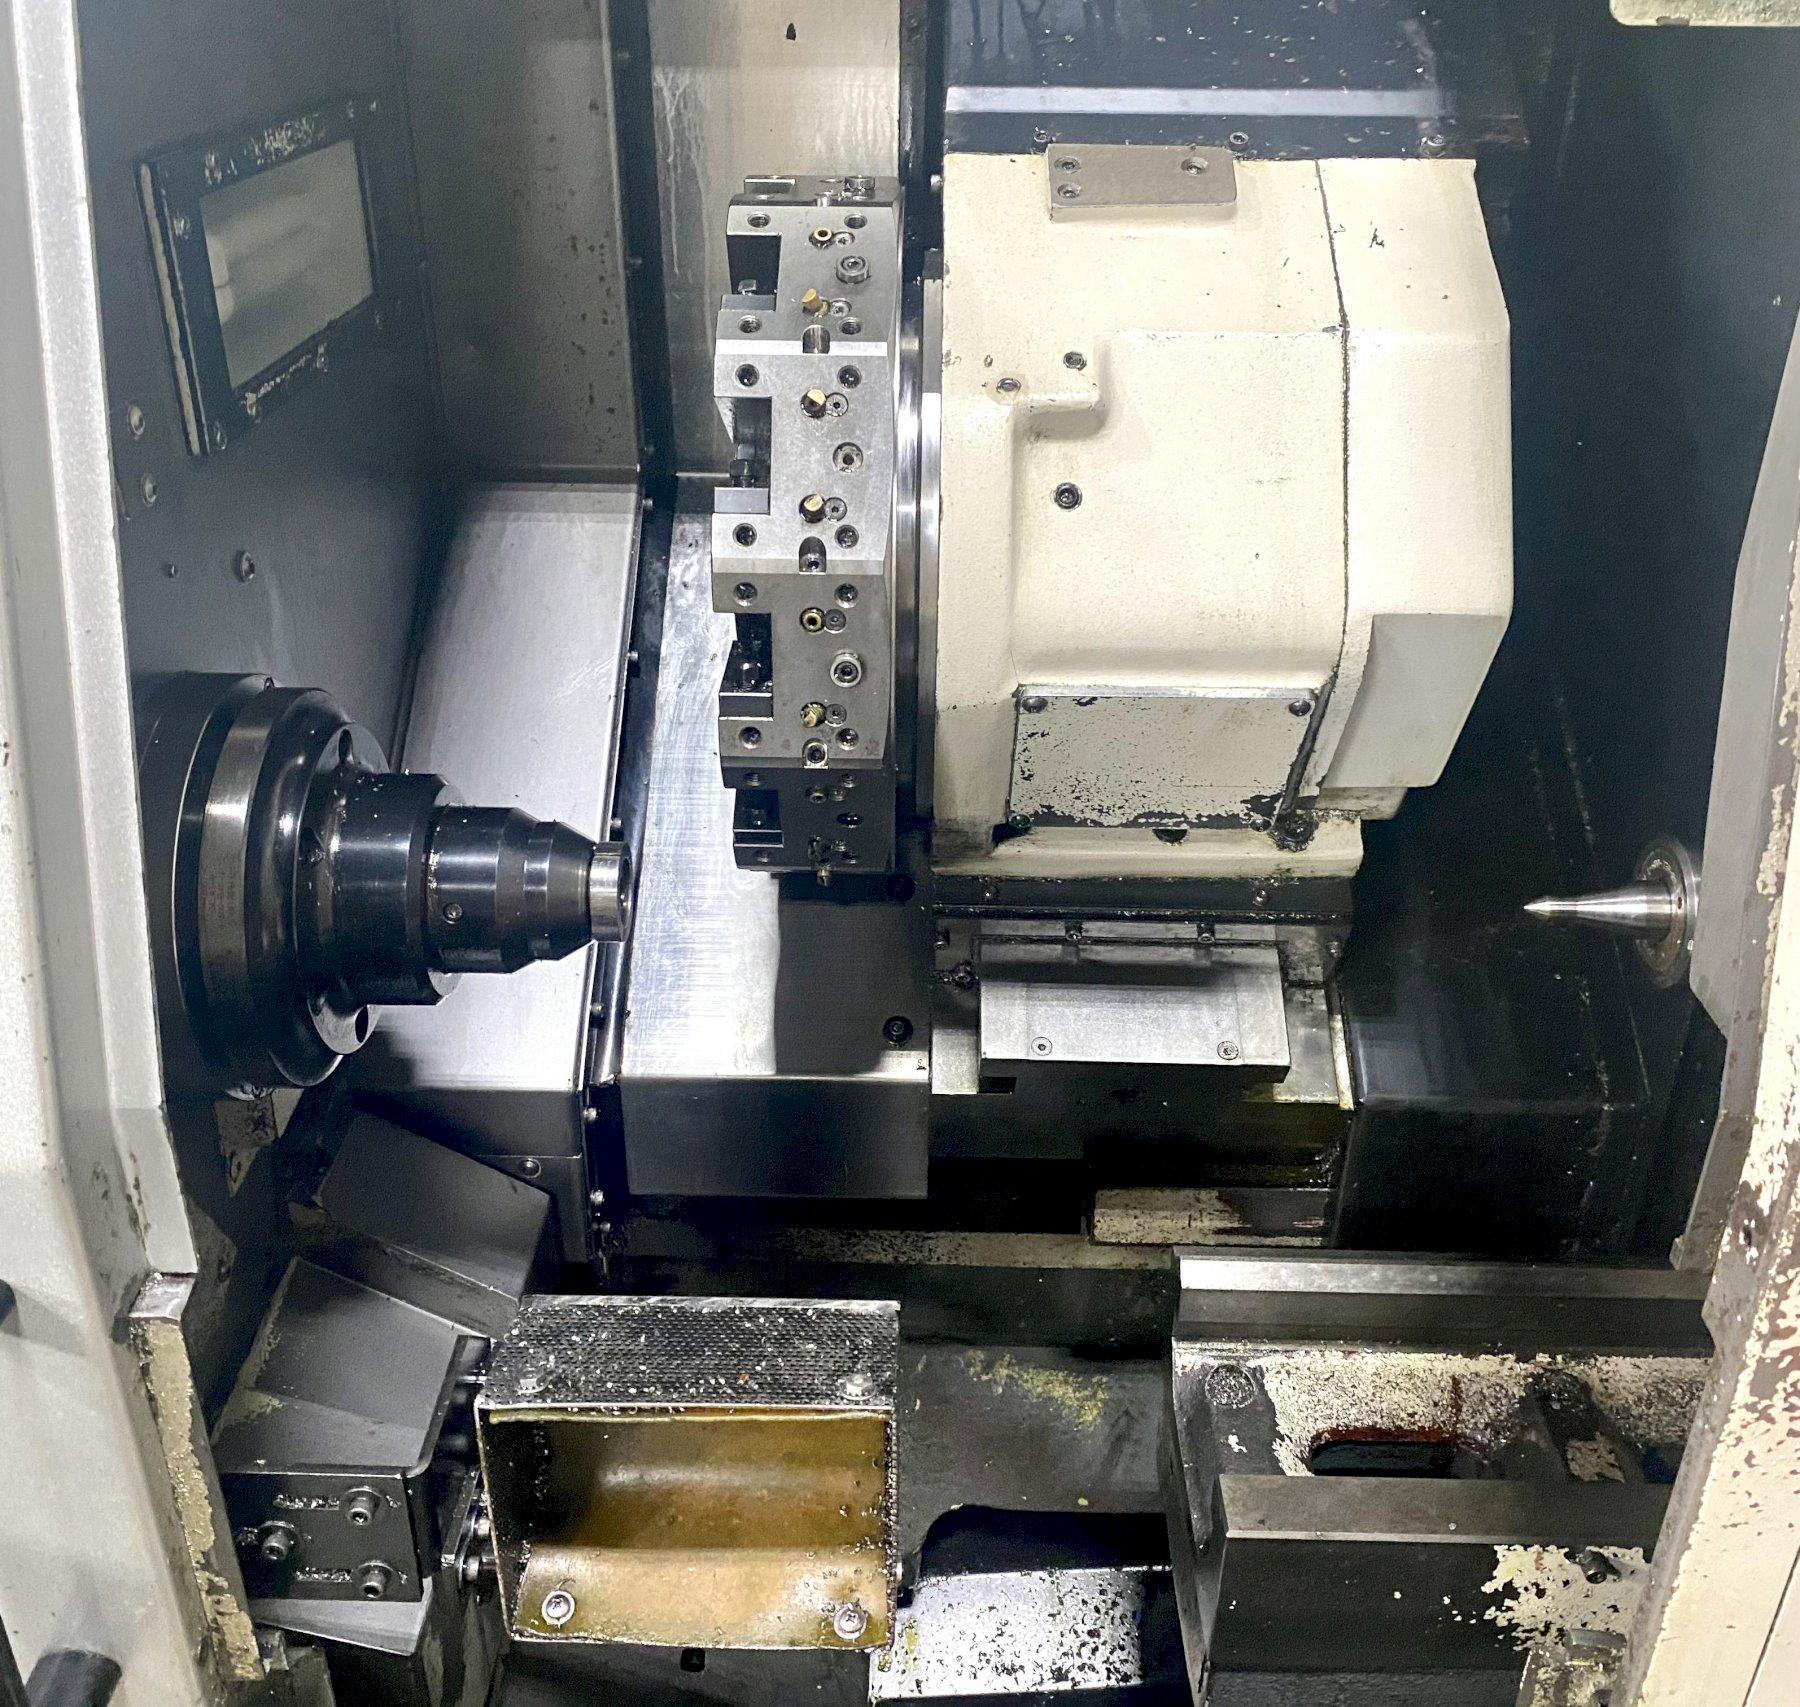 "OKUMA HERITAGE ES-L8II CNC TURNING CENTER, Okuma OSP-U10L CNC Control, 5C Royal Collet Chuck, Tailstock w/ 20"" Between Centers, 18"" Max Swing, 2"" Bar Capacity, Tailstock, Chip Conveyor, New 2007."